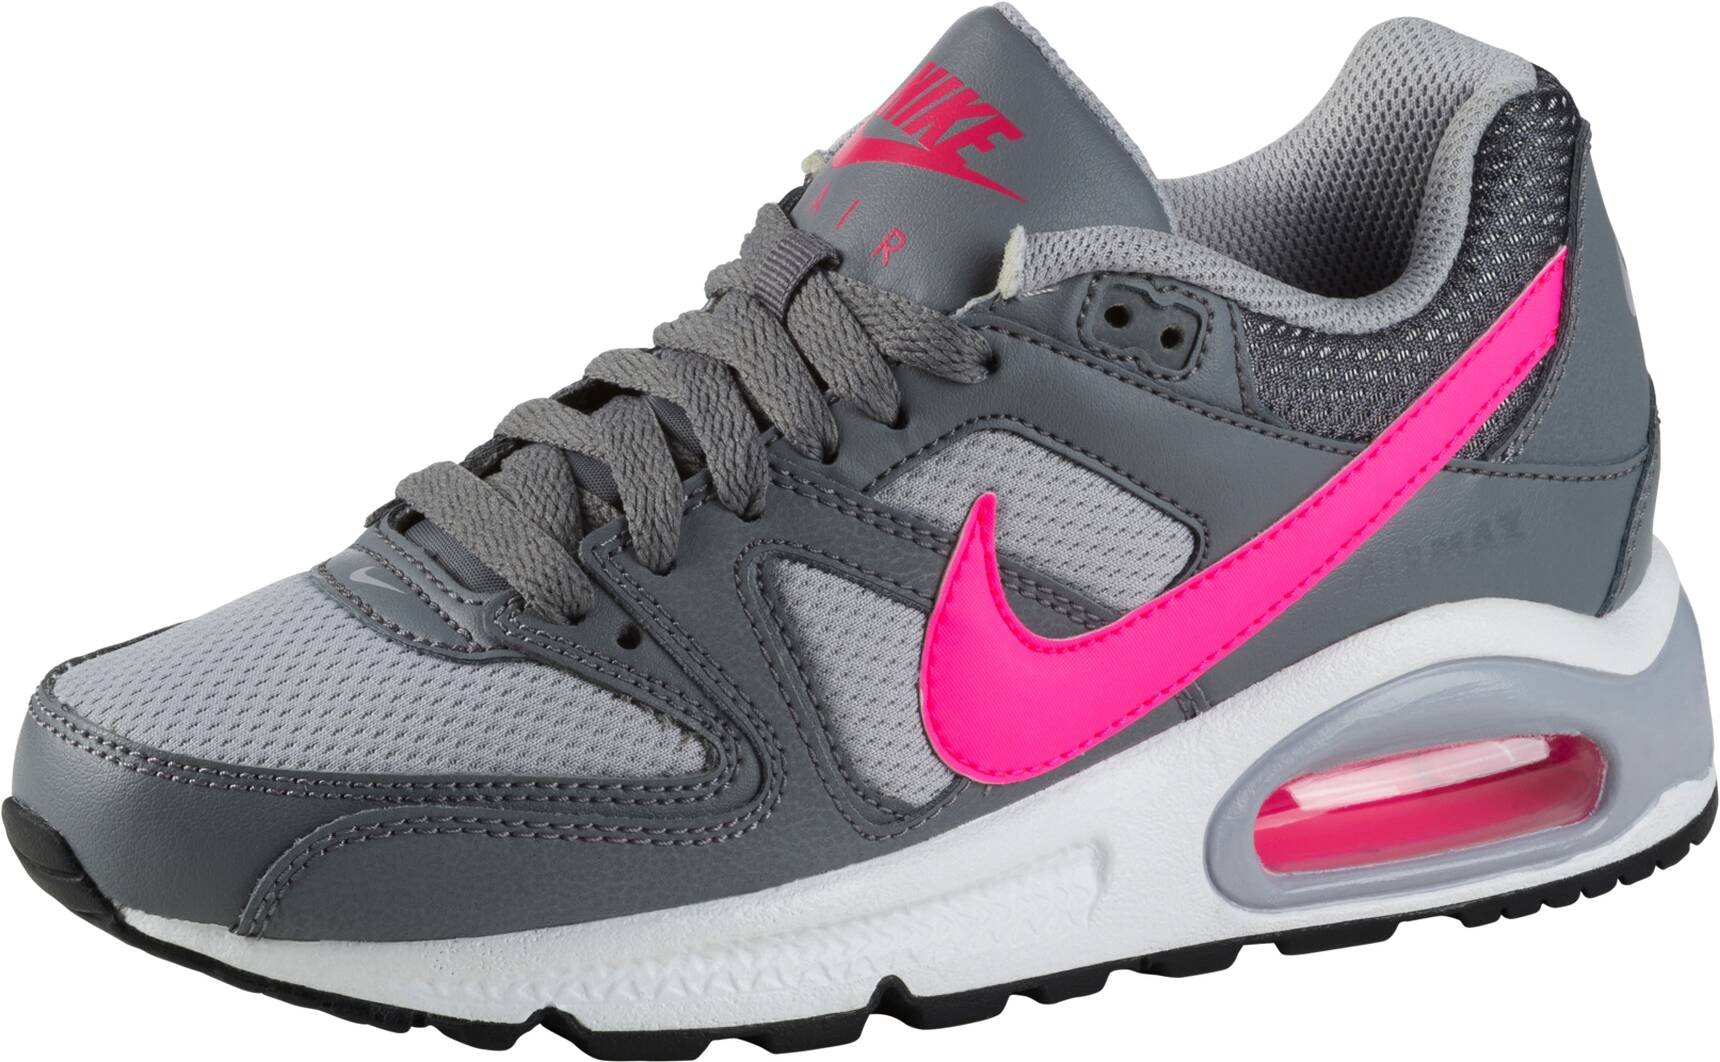 Nike Air Max Command Herren Sale Black Silver Mens Free 3.0